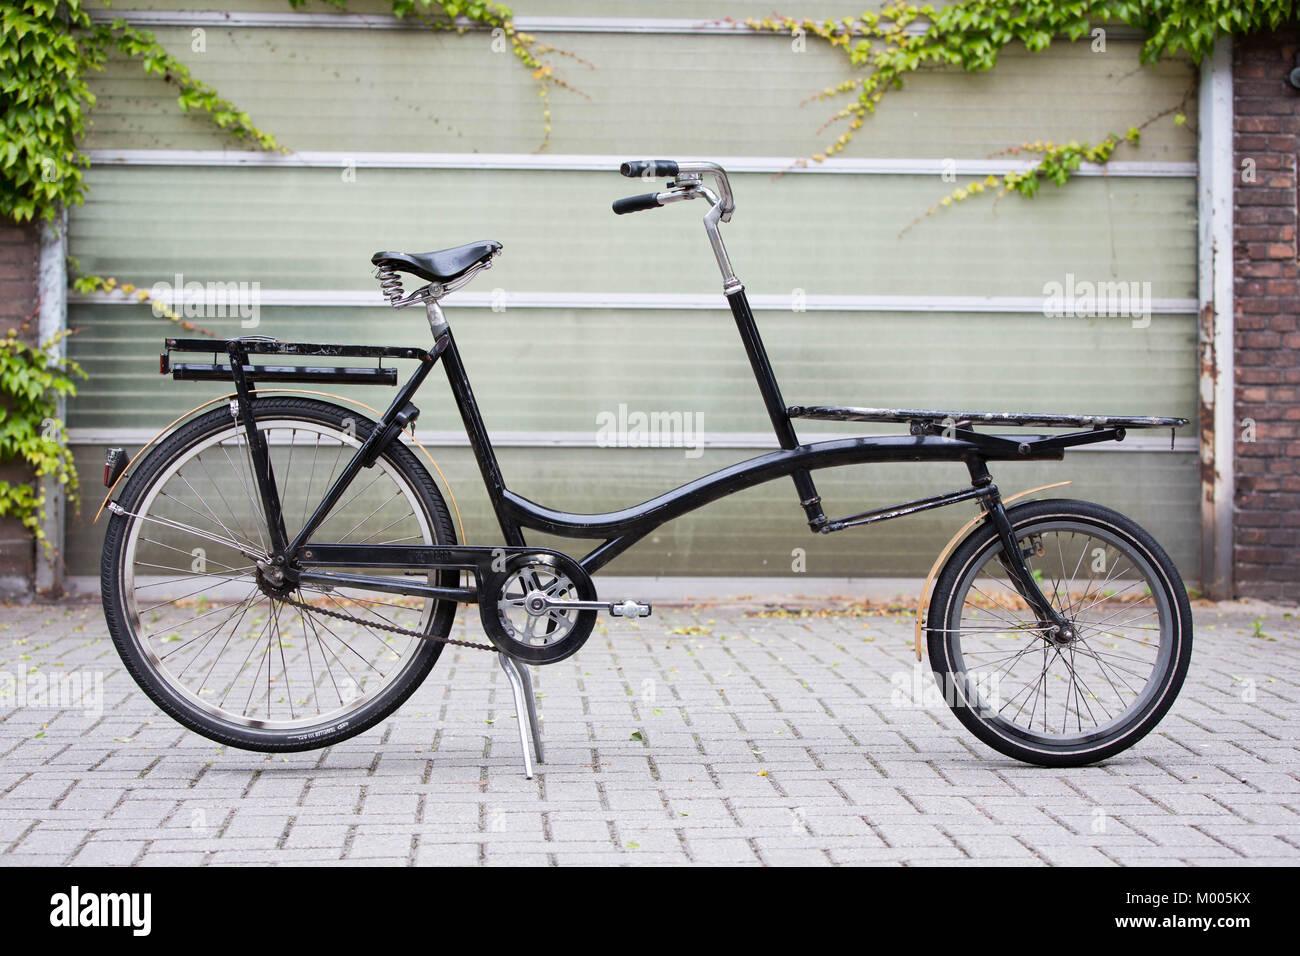 Customized Bicycle Stock Photos & Customized Bicycle Stock Images ...